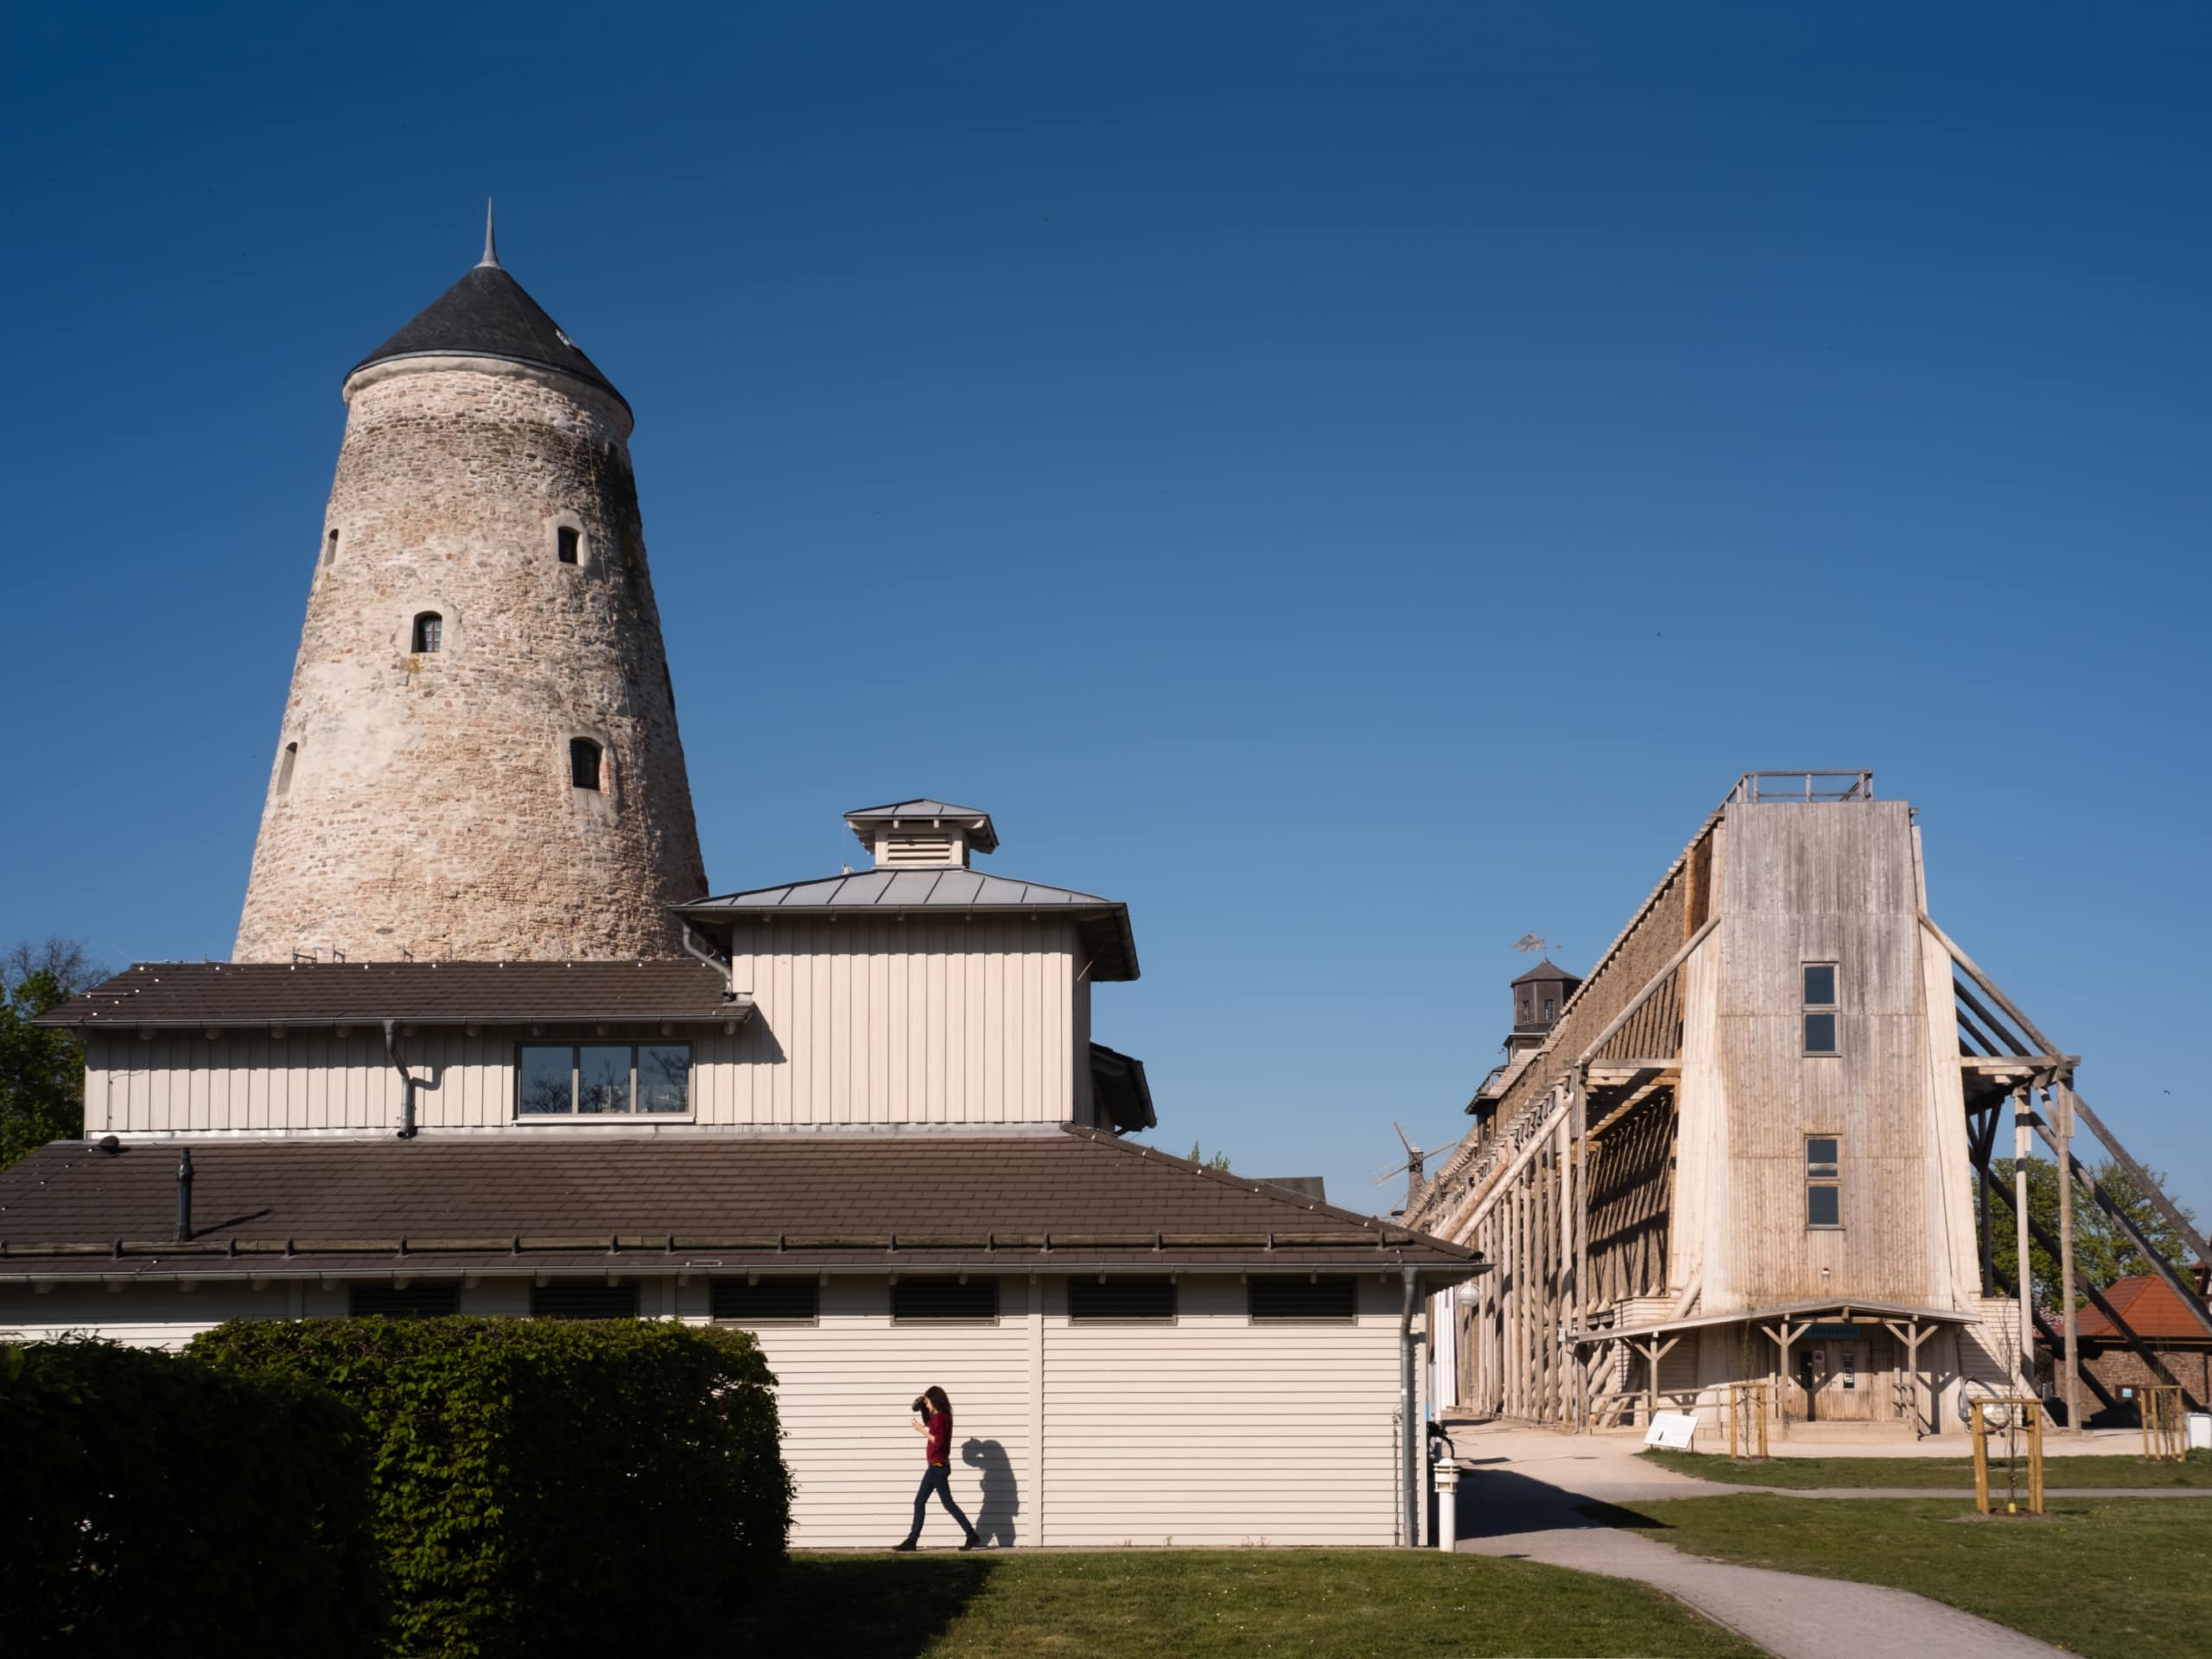 Industriekultur – Kunsthof Bad Salzelmen